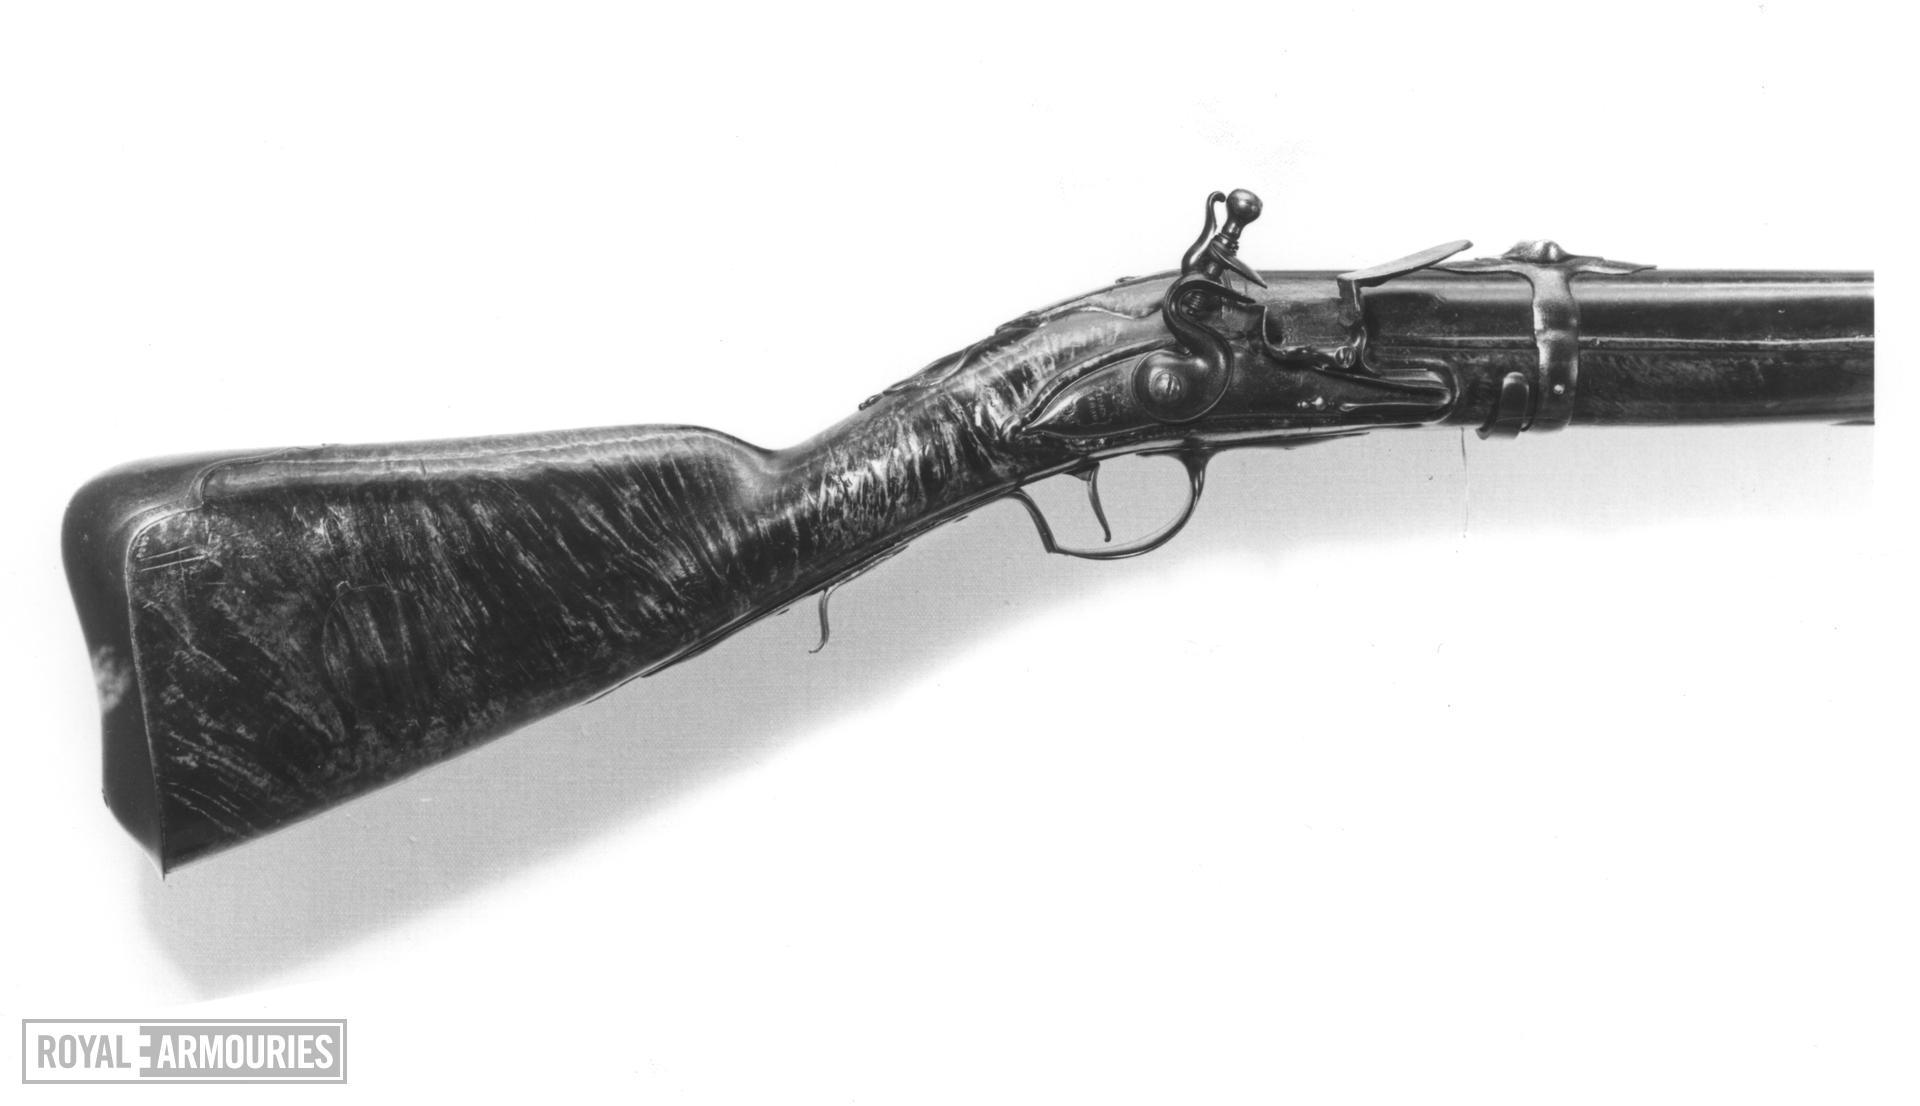 Flintlock sporting gun - By John Shaw